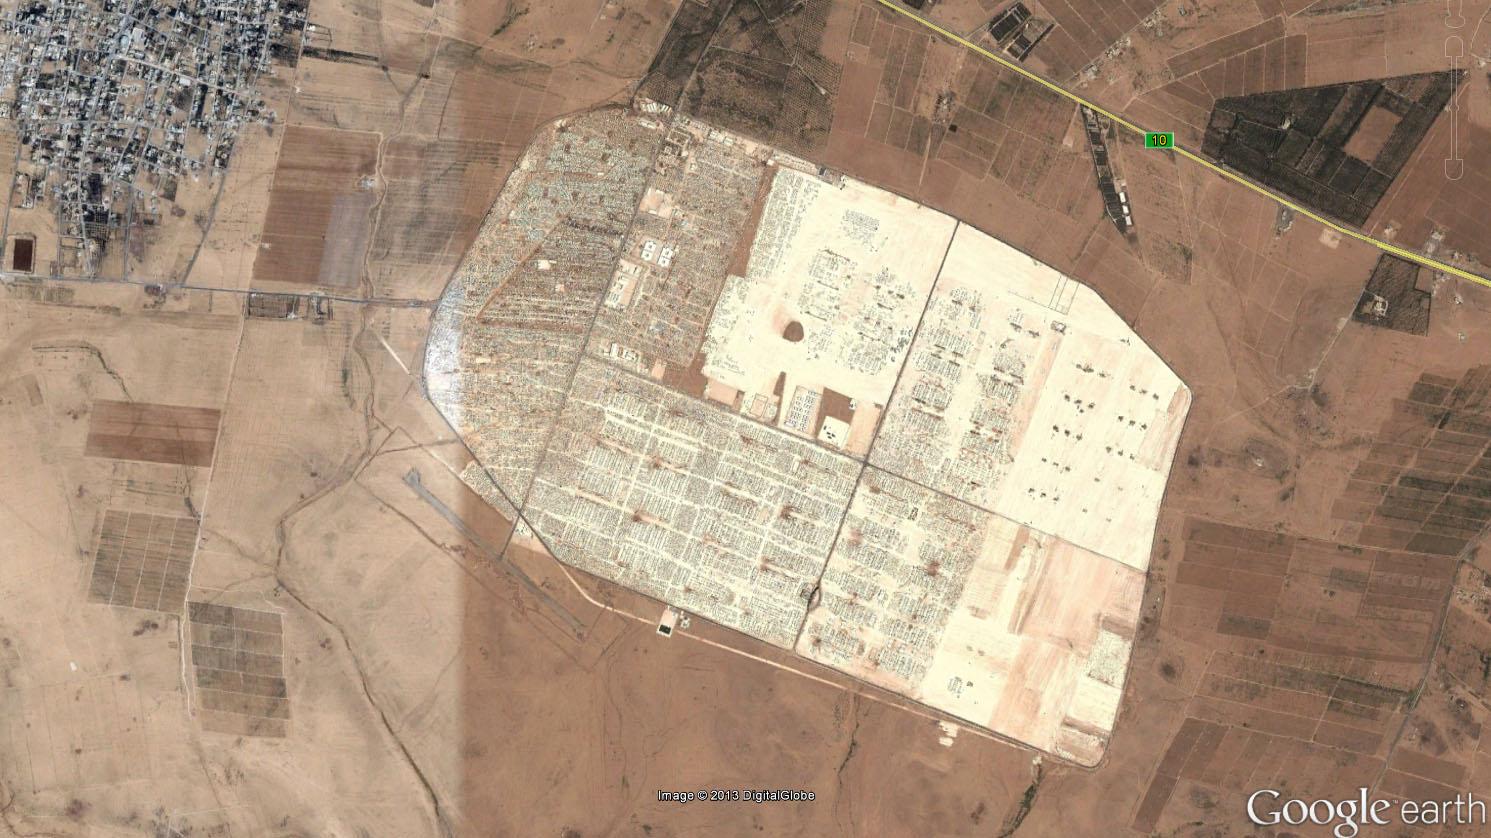 Fig. 5, UNHCR Zaatari Camp (مخيم الزعتري), Jordan, 2013